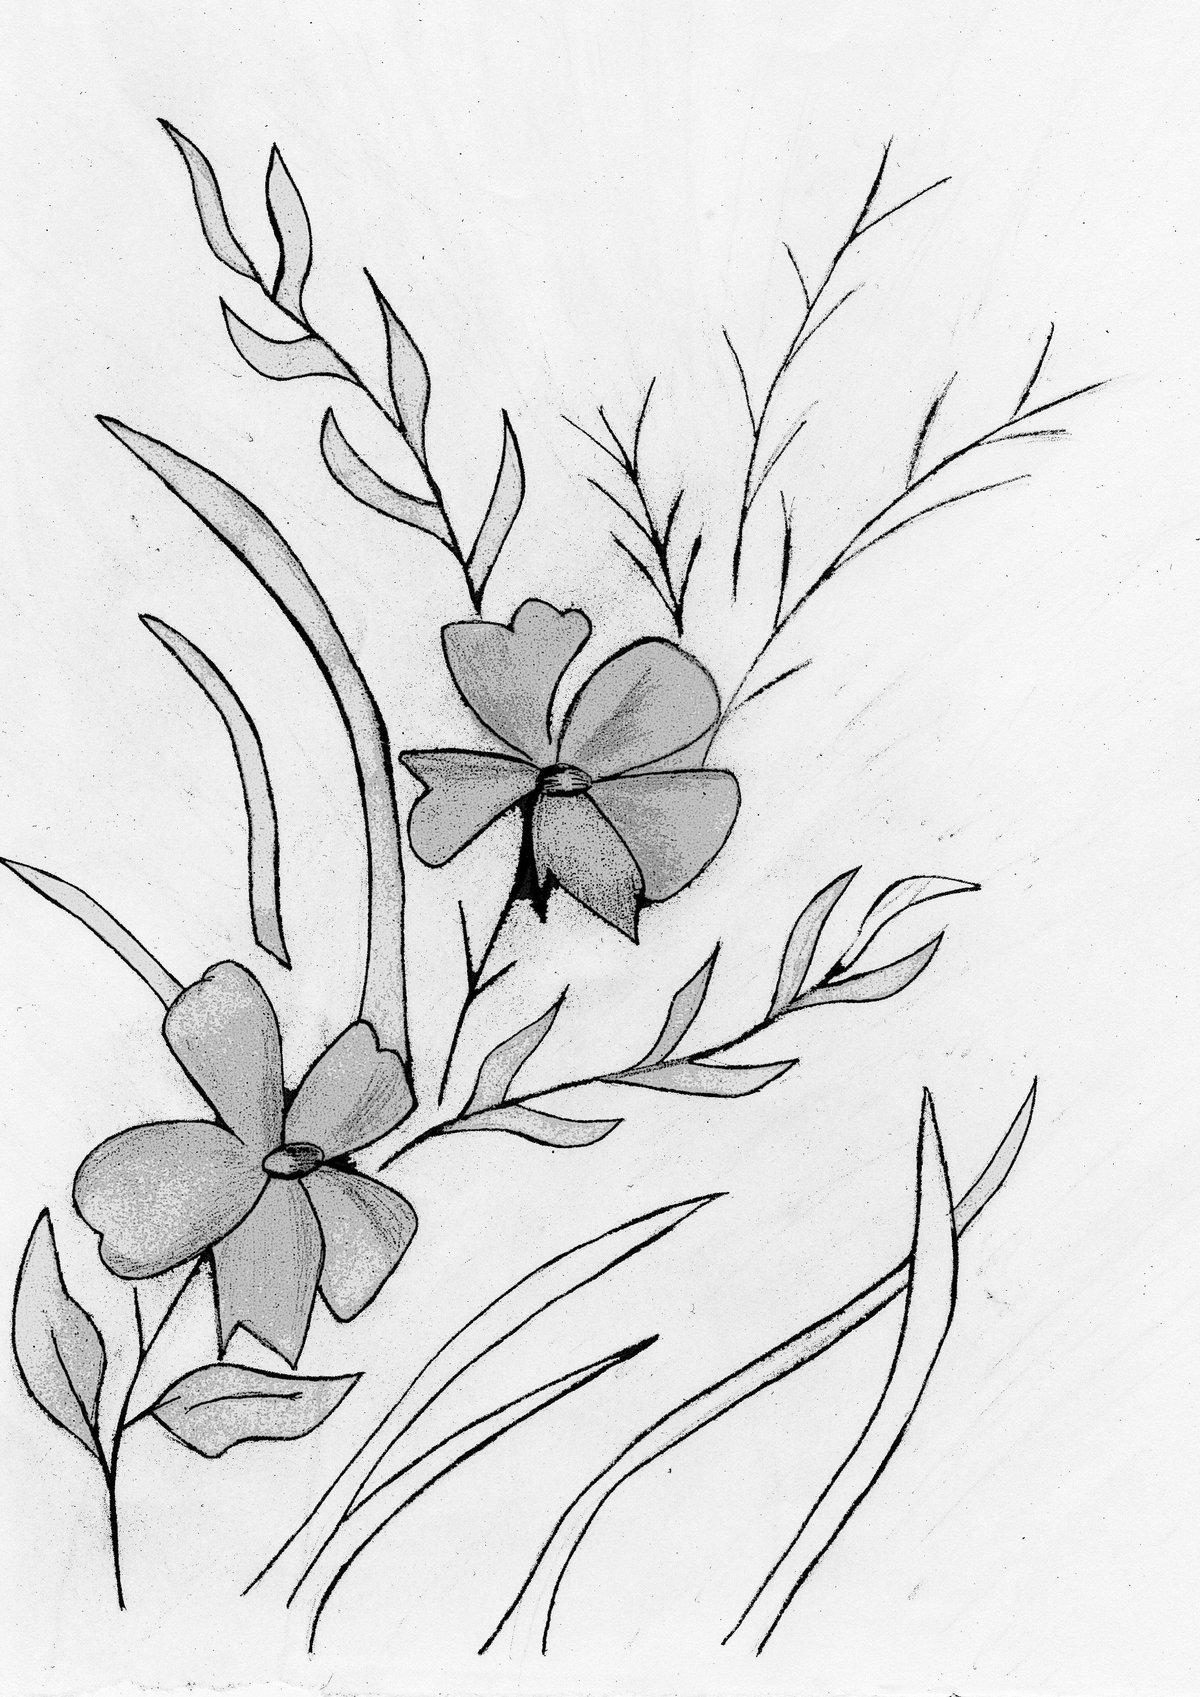 Картинки рисунки цветы карандашом, летием сына